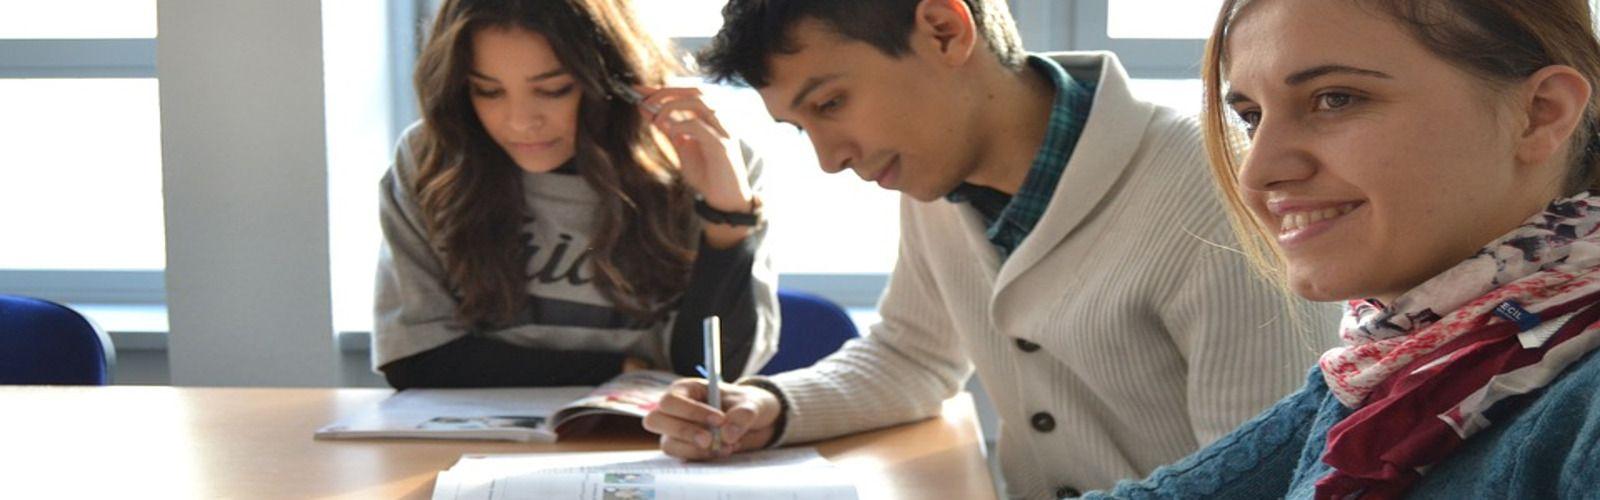 cursos-homologacion-estudios-tramites